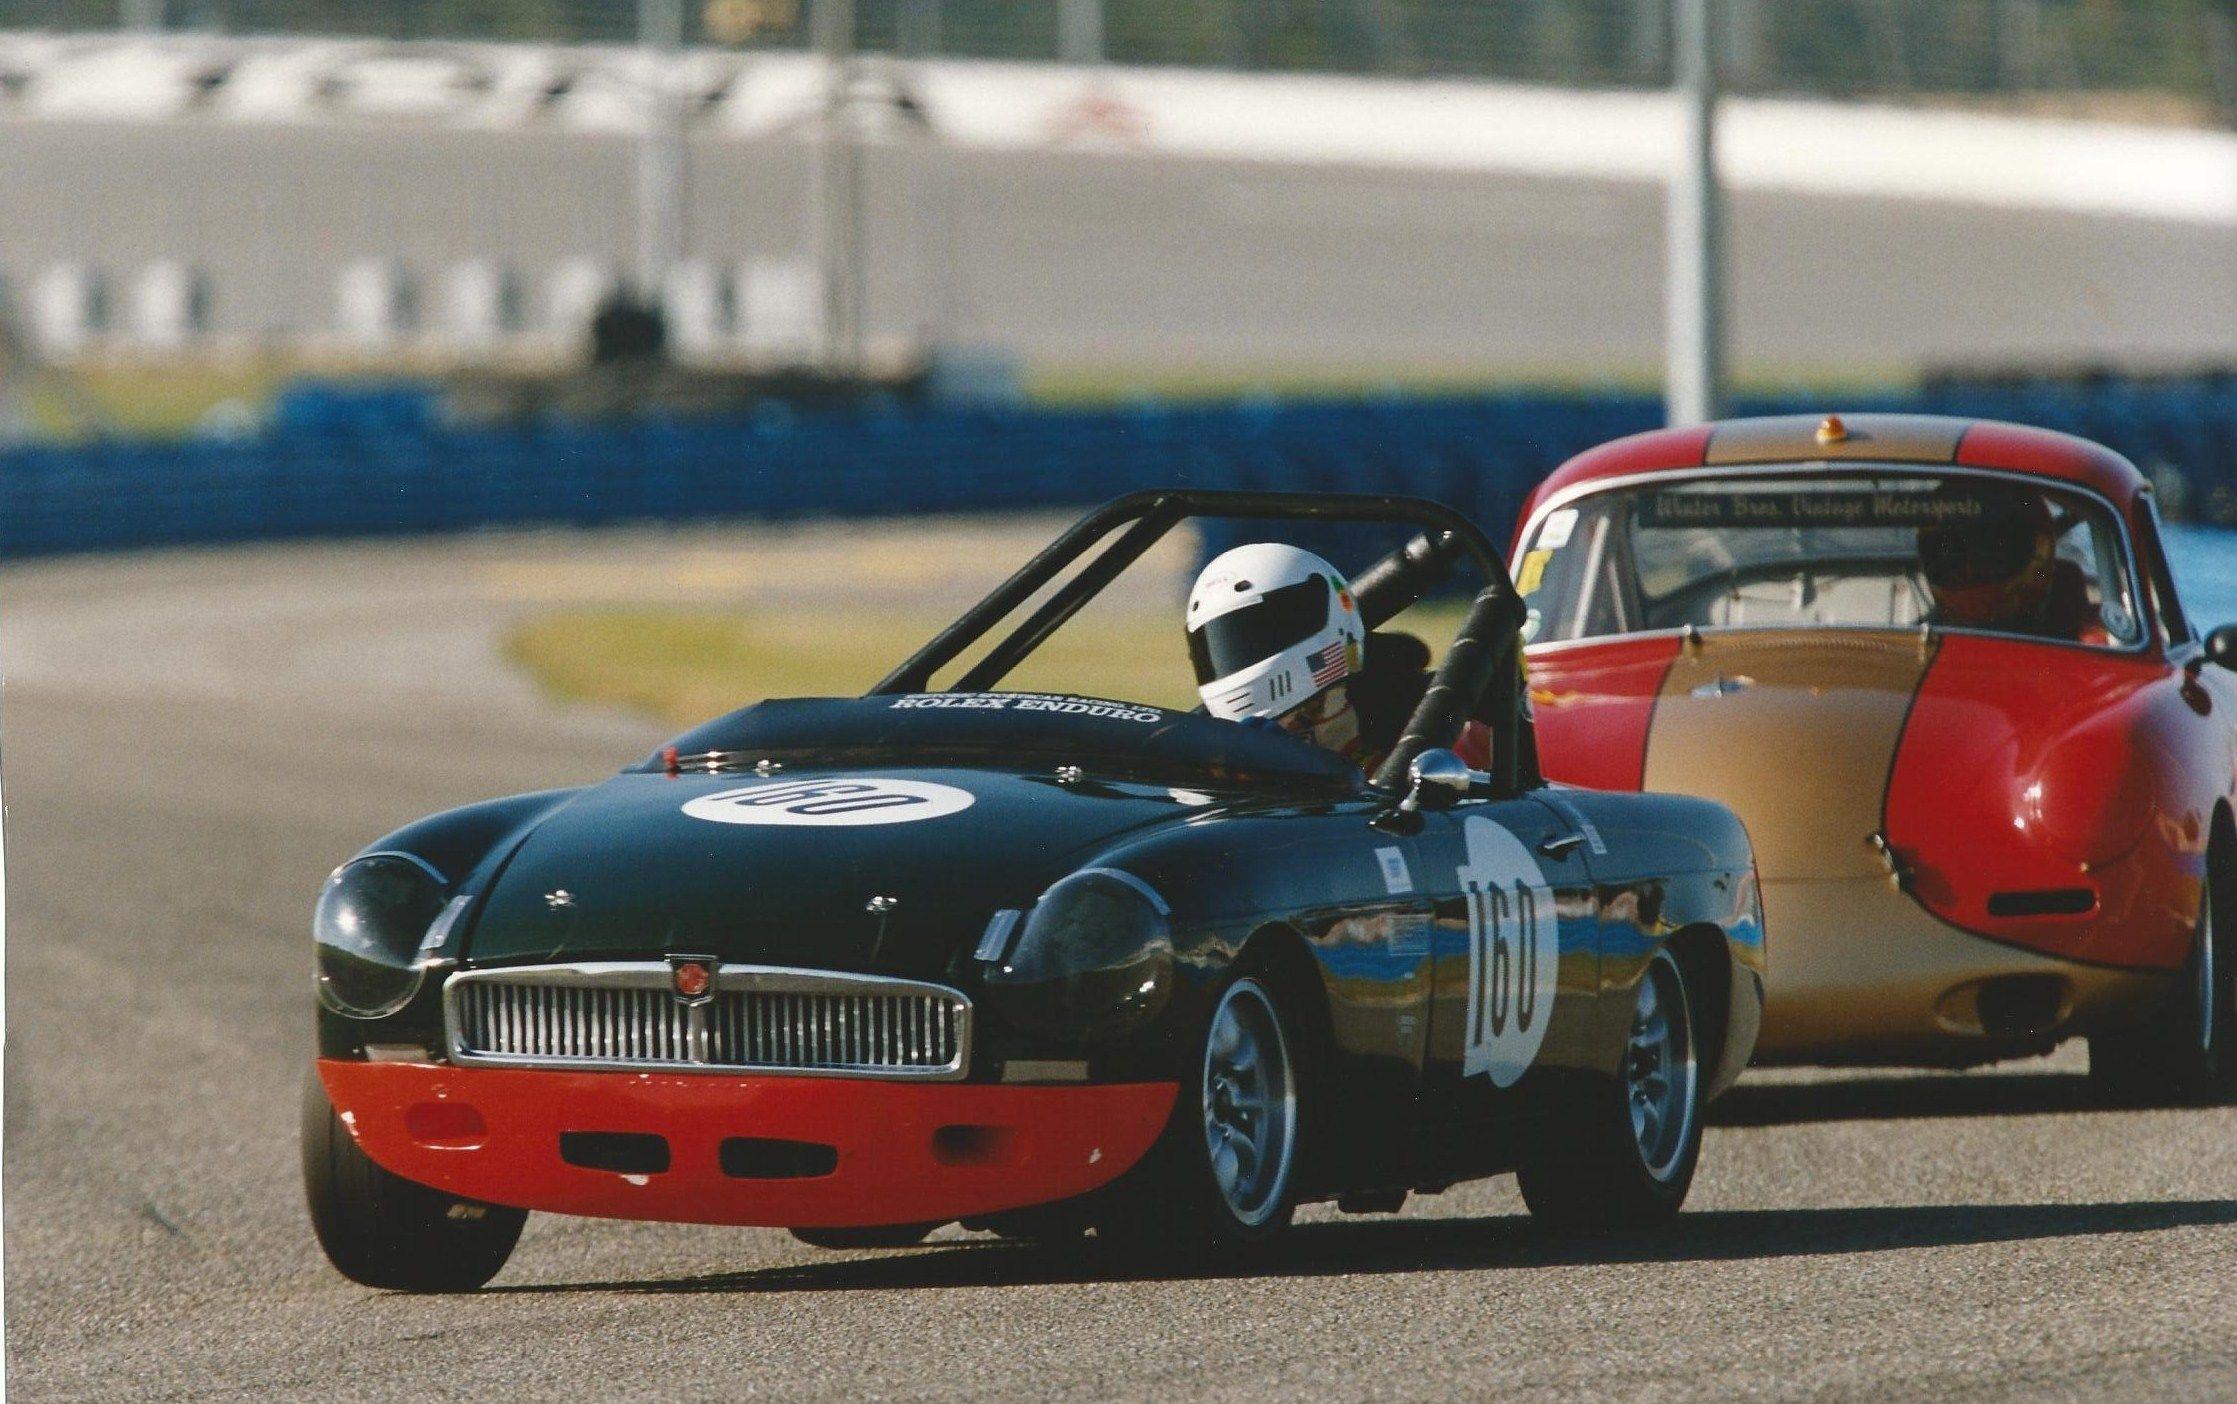 The Apexautolines/Dart Motorsports vintage MGB at Daytona HSR races ...